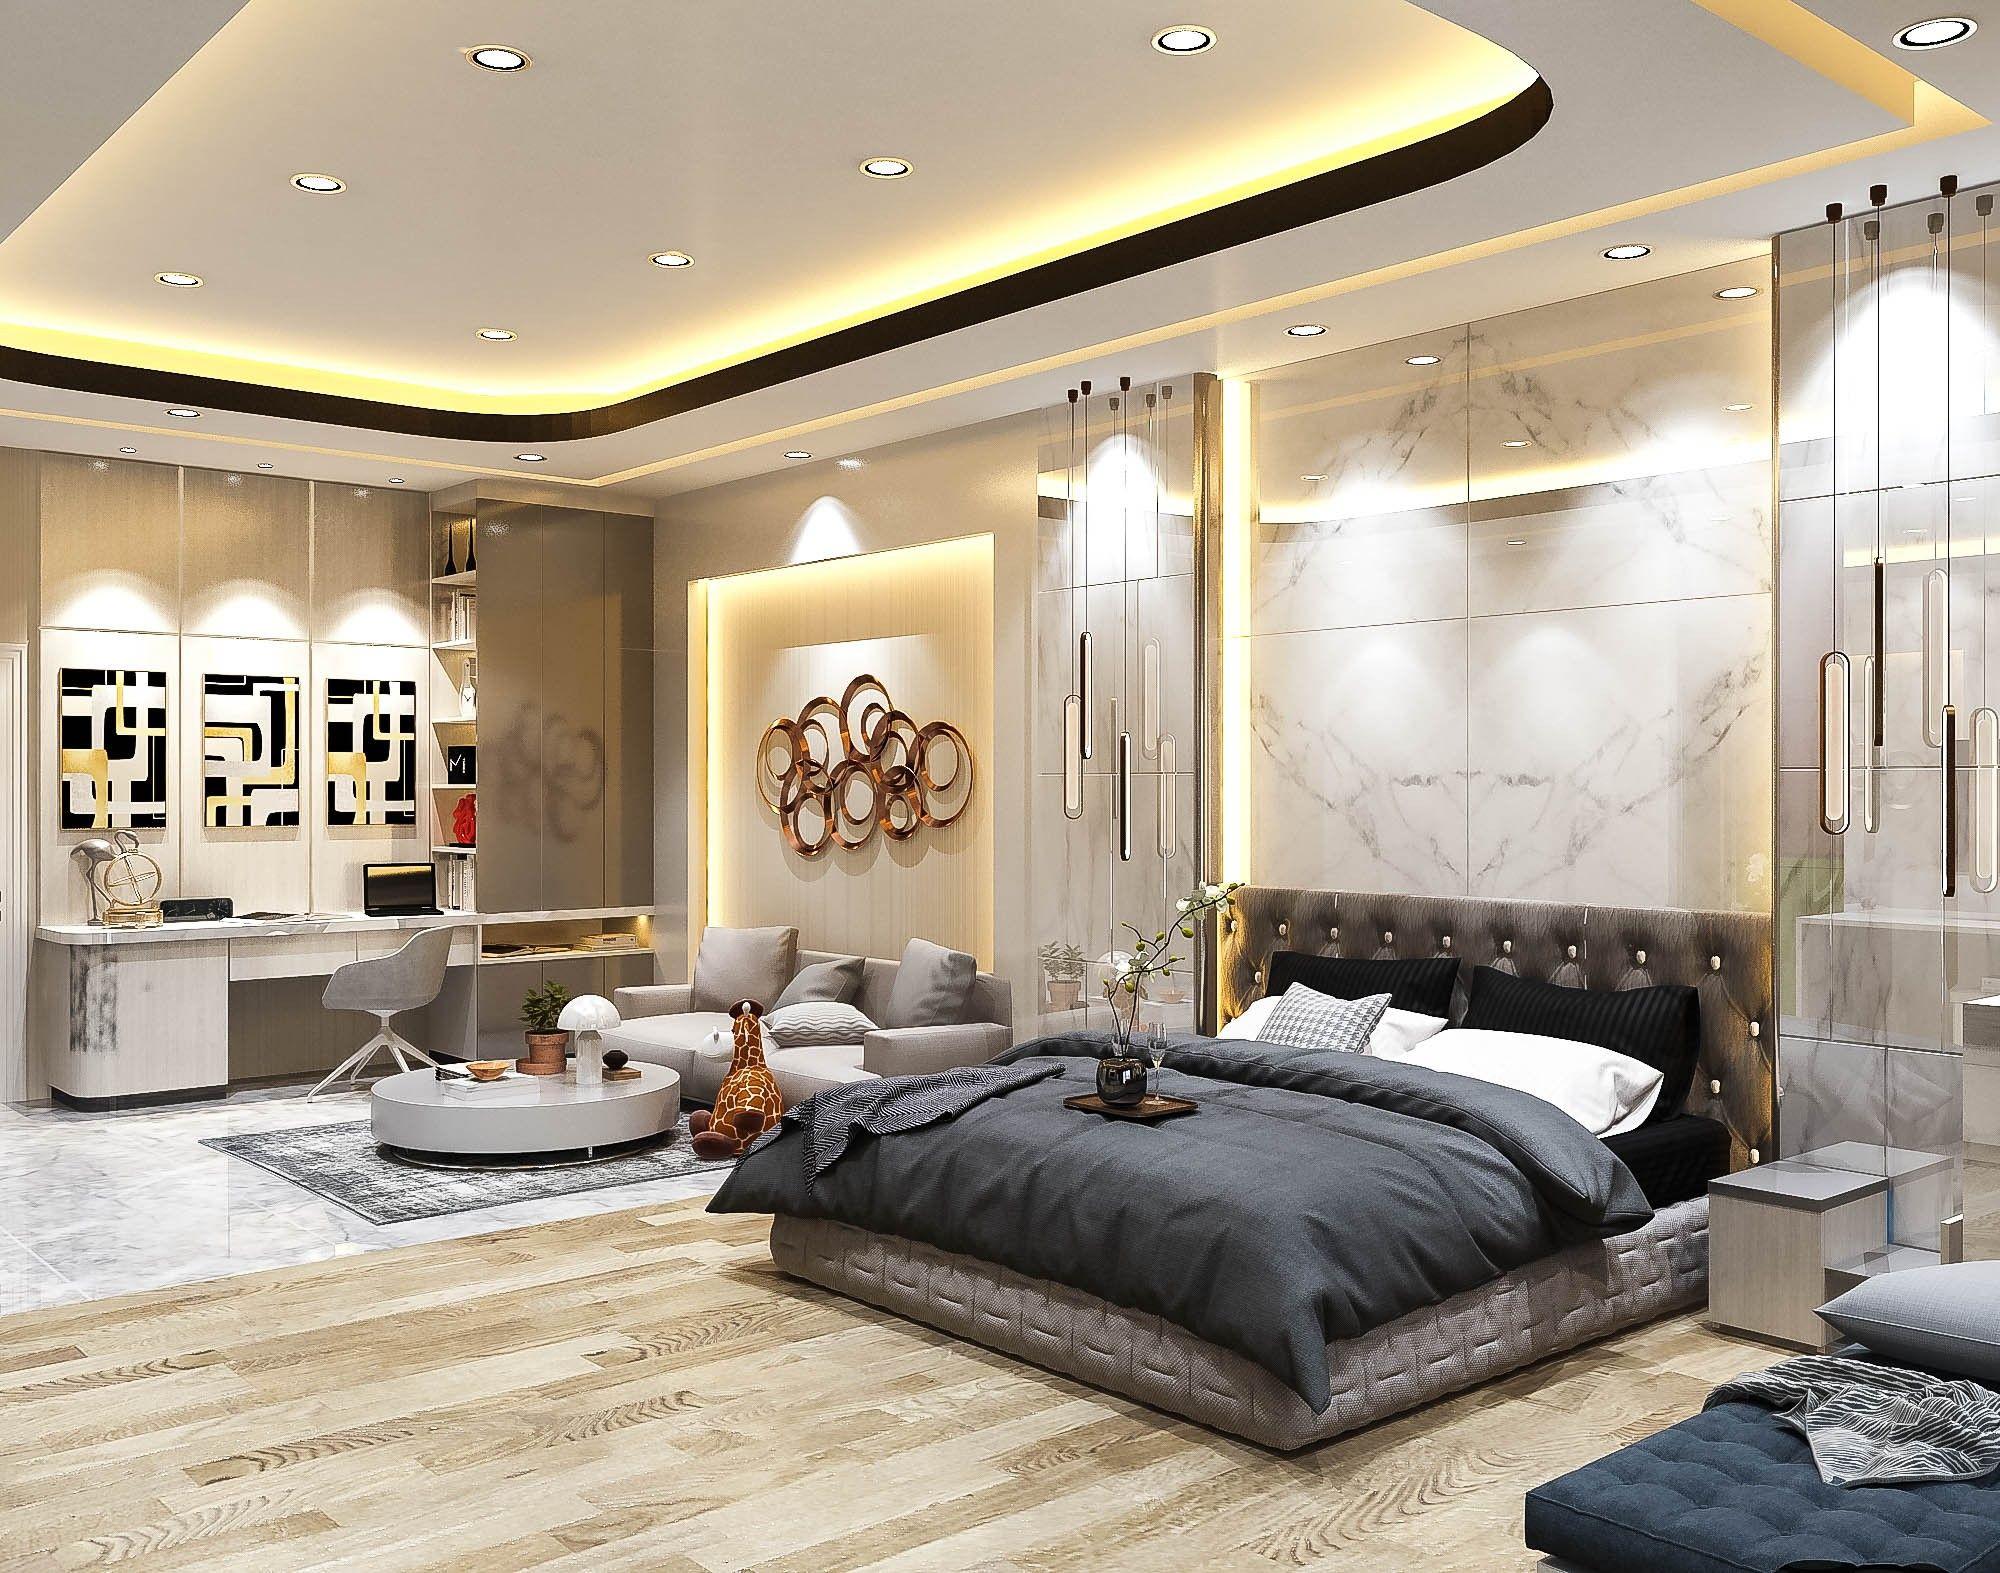 Master Bedroom Design Elegant Luxury White Theme Luxury Master Bedroom Design Luxury Bedroom Master Modern Luxury Bedroom Elegant luxury room design